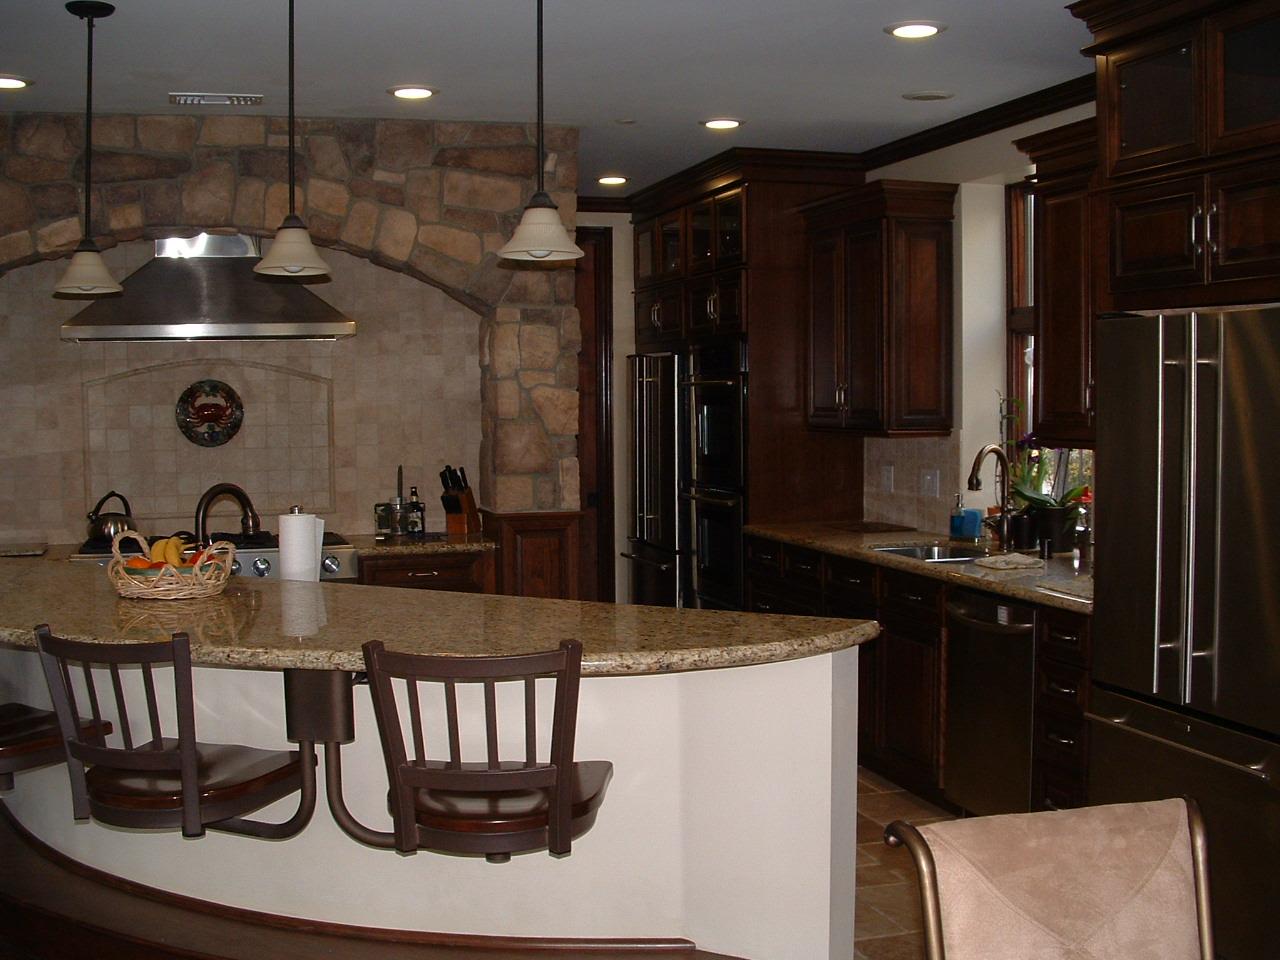 Kitchen Appliances Counterop